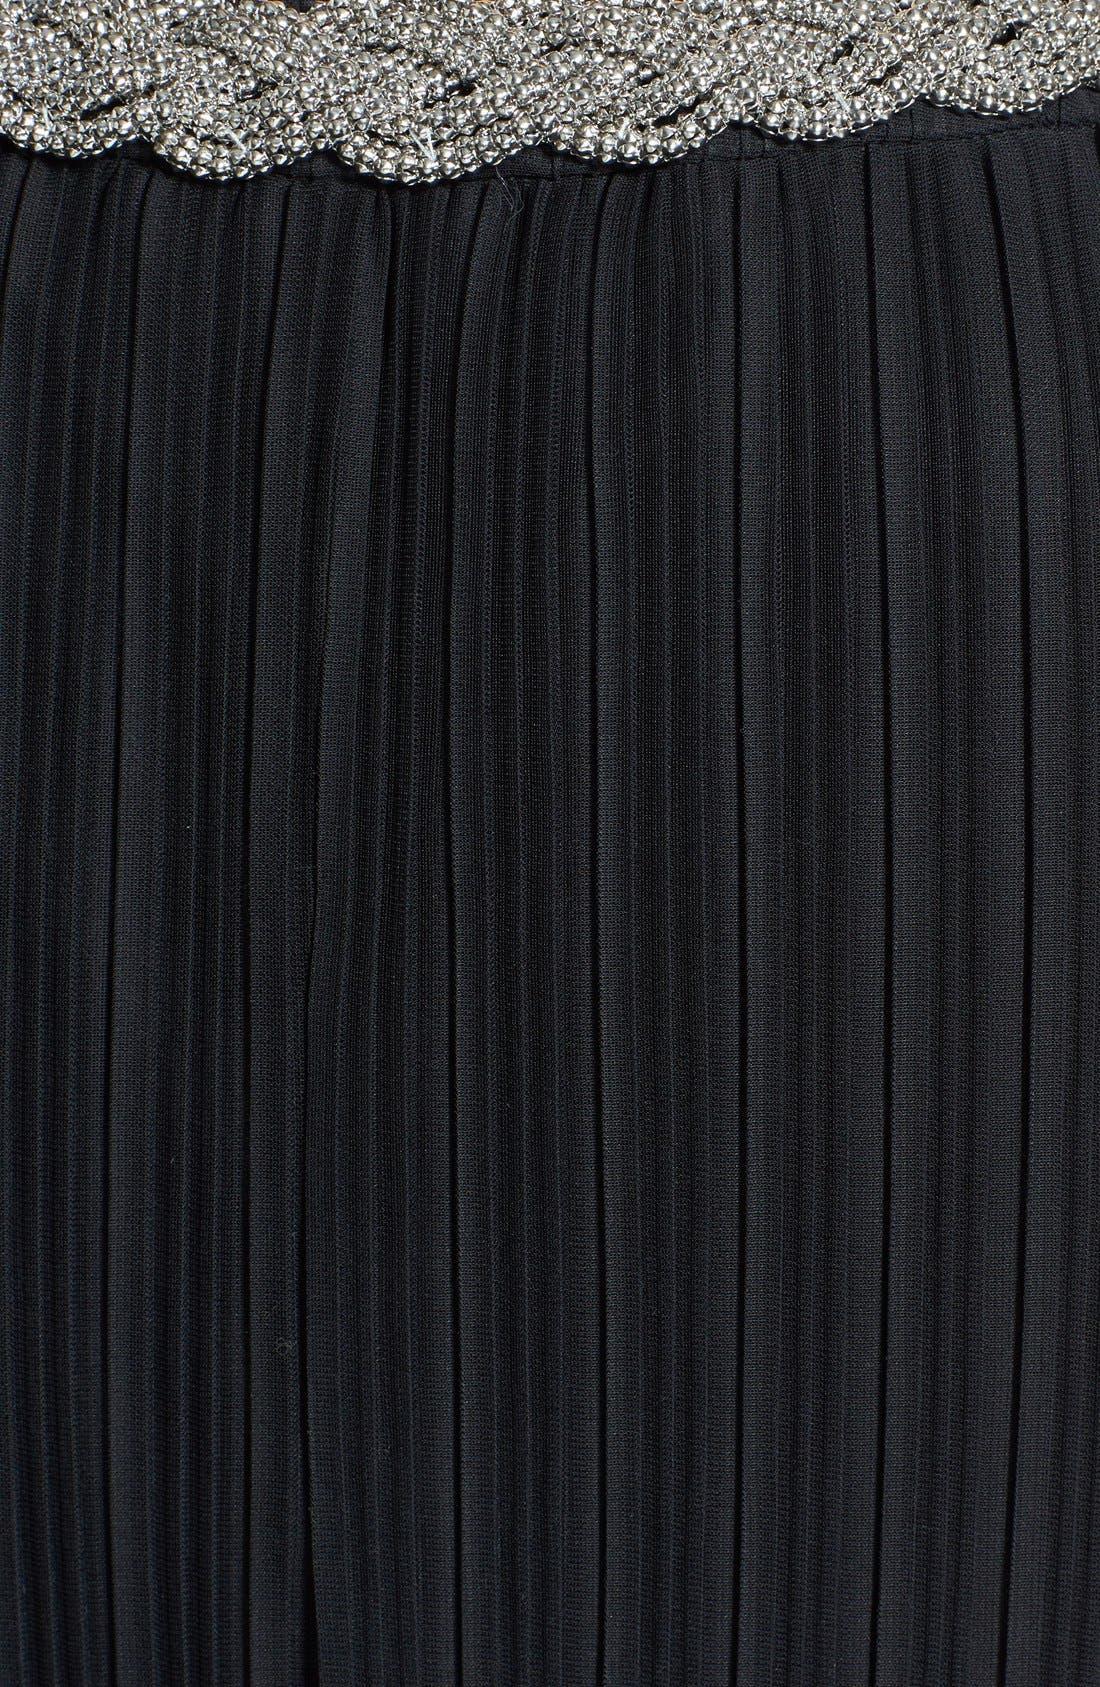 Embellished Neck Chiffon Shift Dress,                             Alternate thumbnail 3, color,                             001